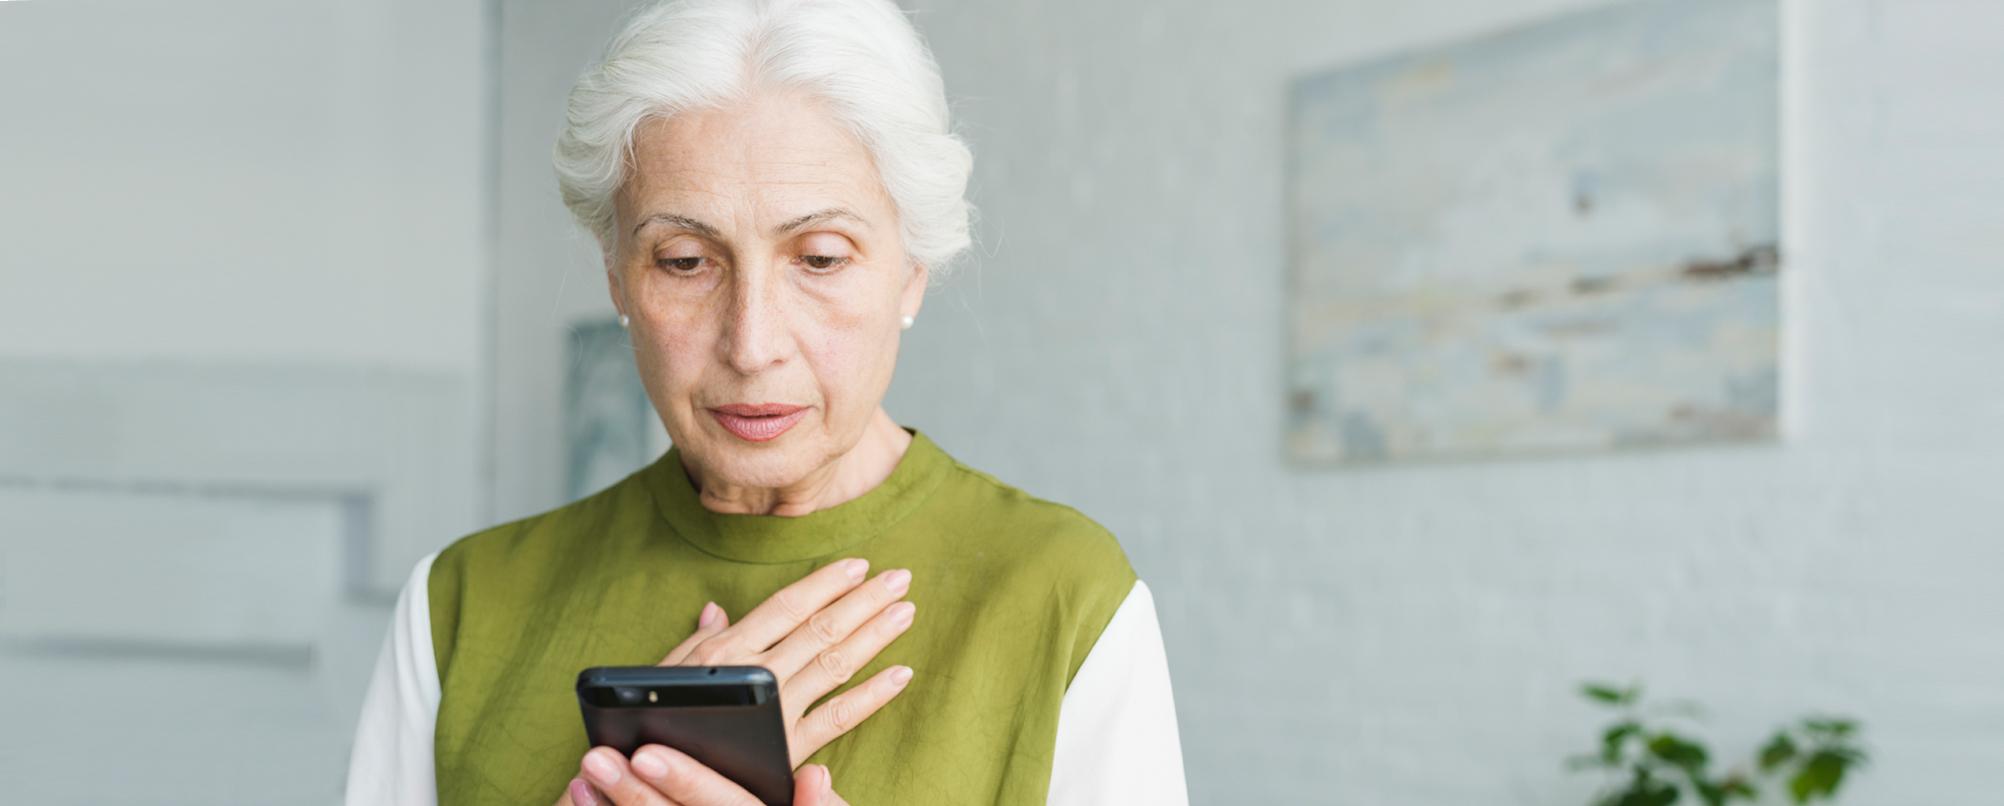 Senior woman surprised by news on phone